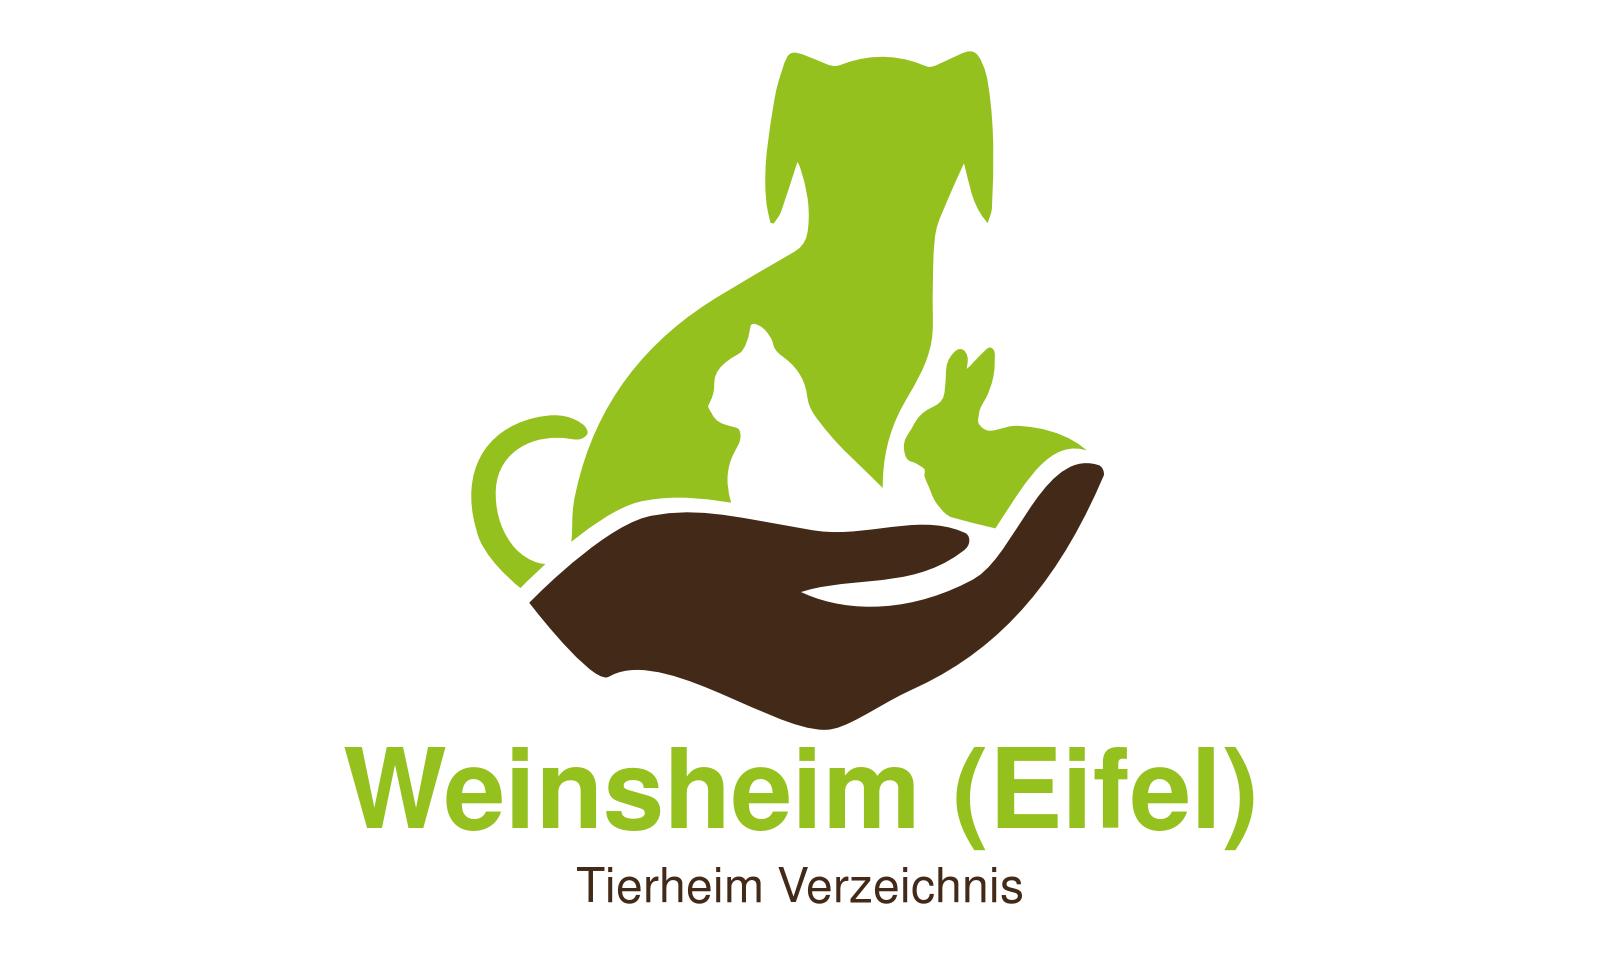 Tierheim Weinsheim (Eifel)